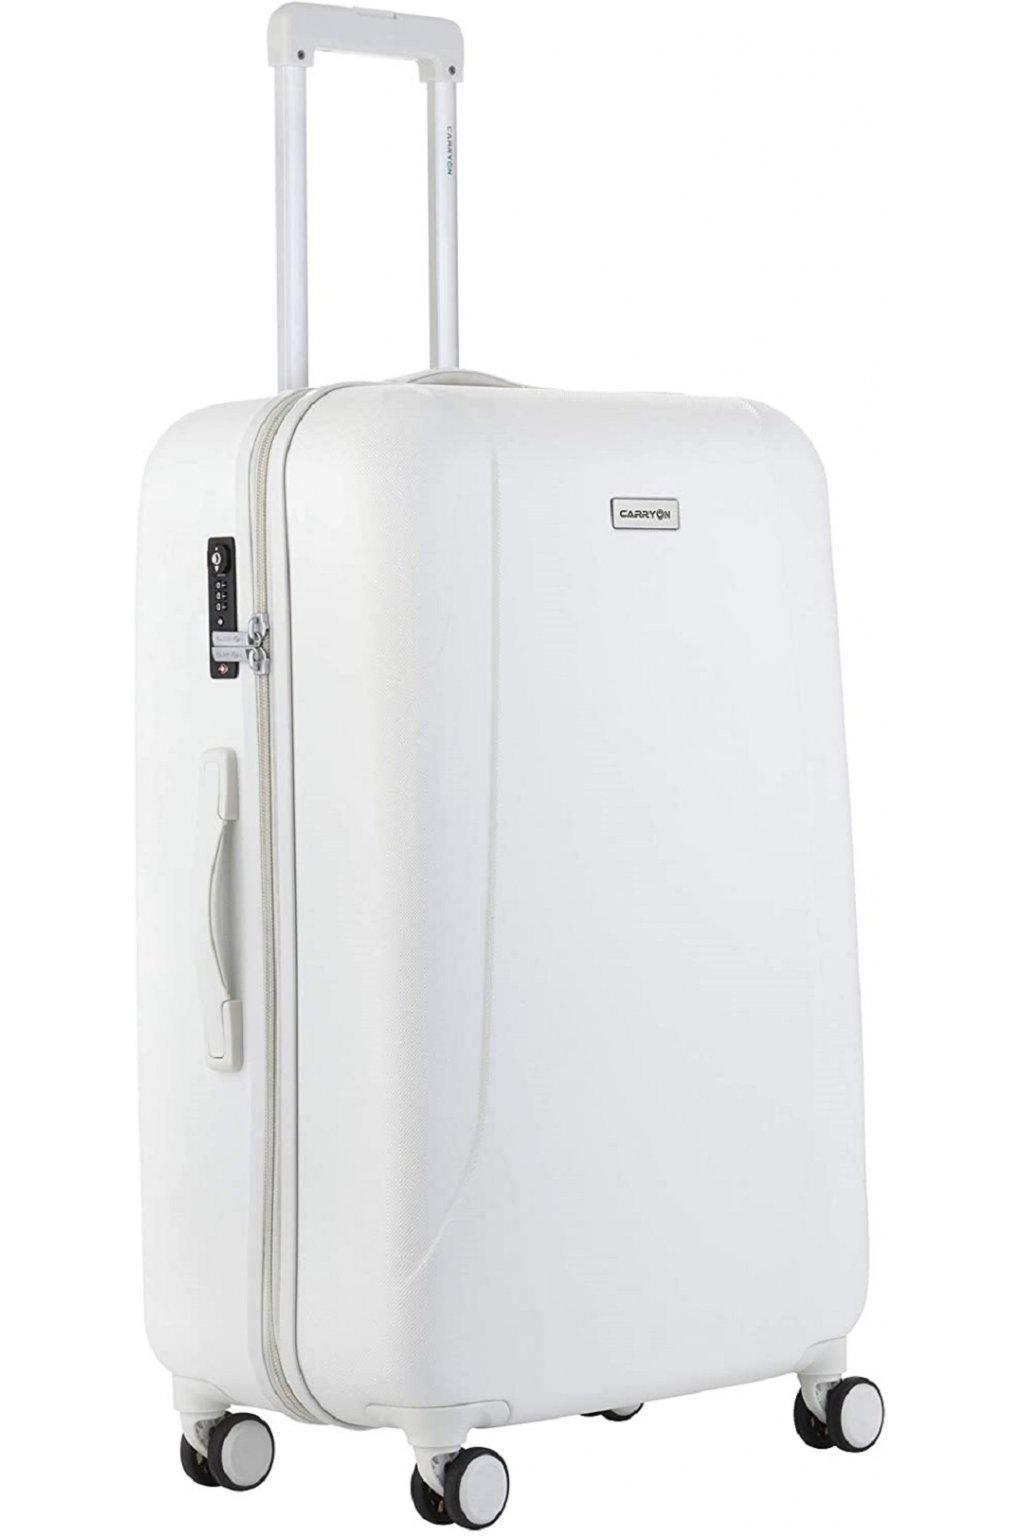 kufrland carryon skyhopper white (3)